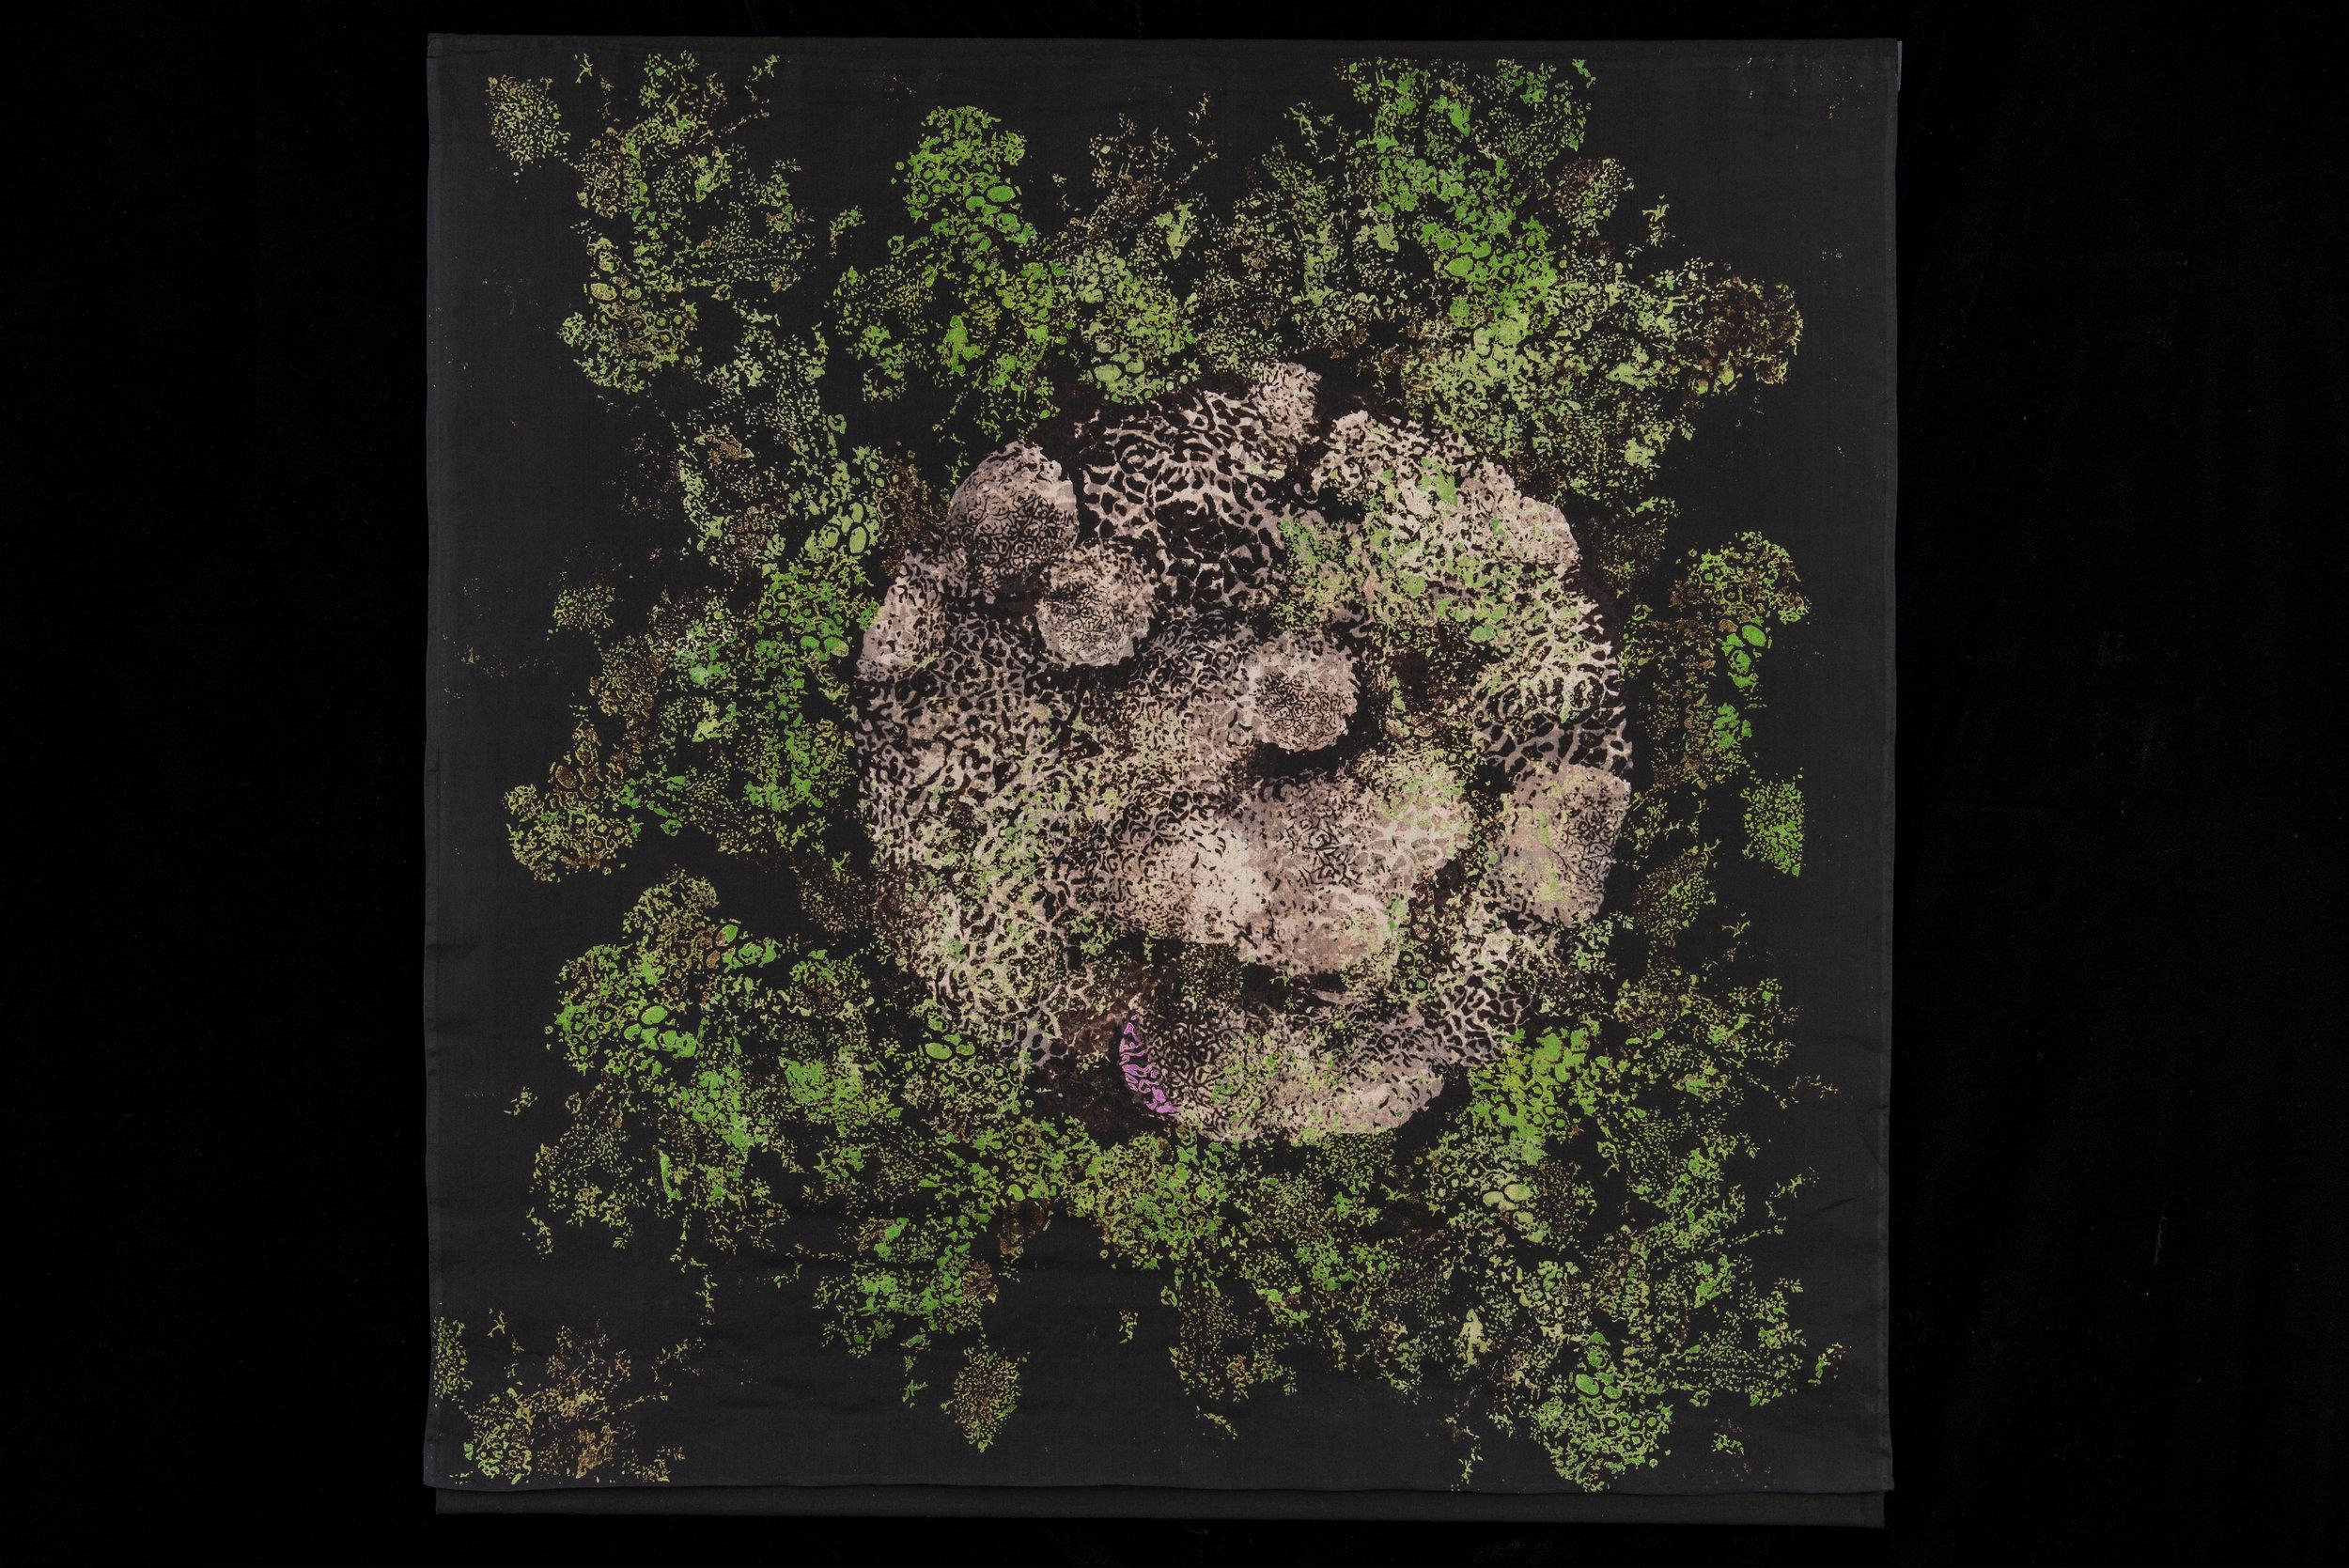 Forest Floor: Moss